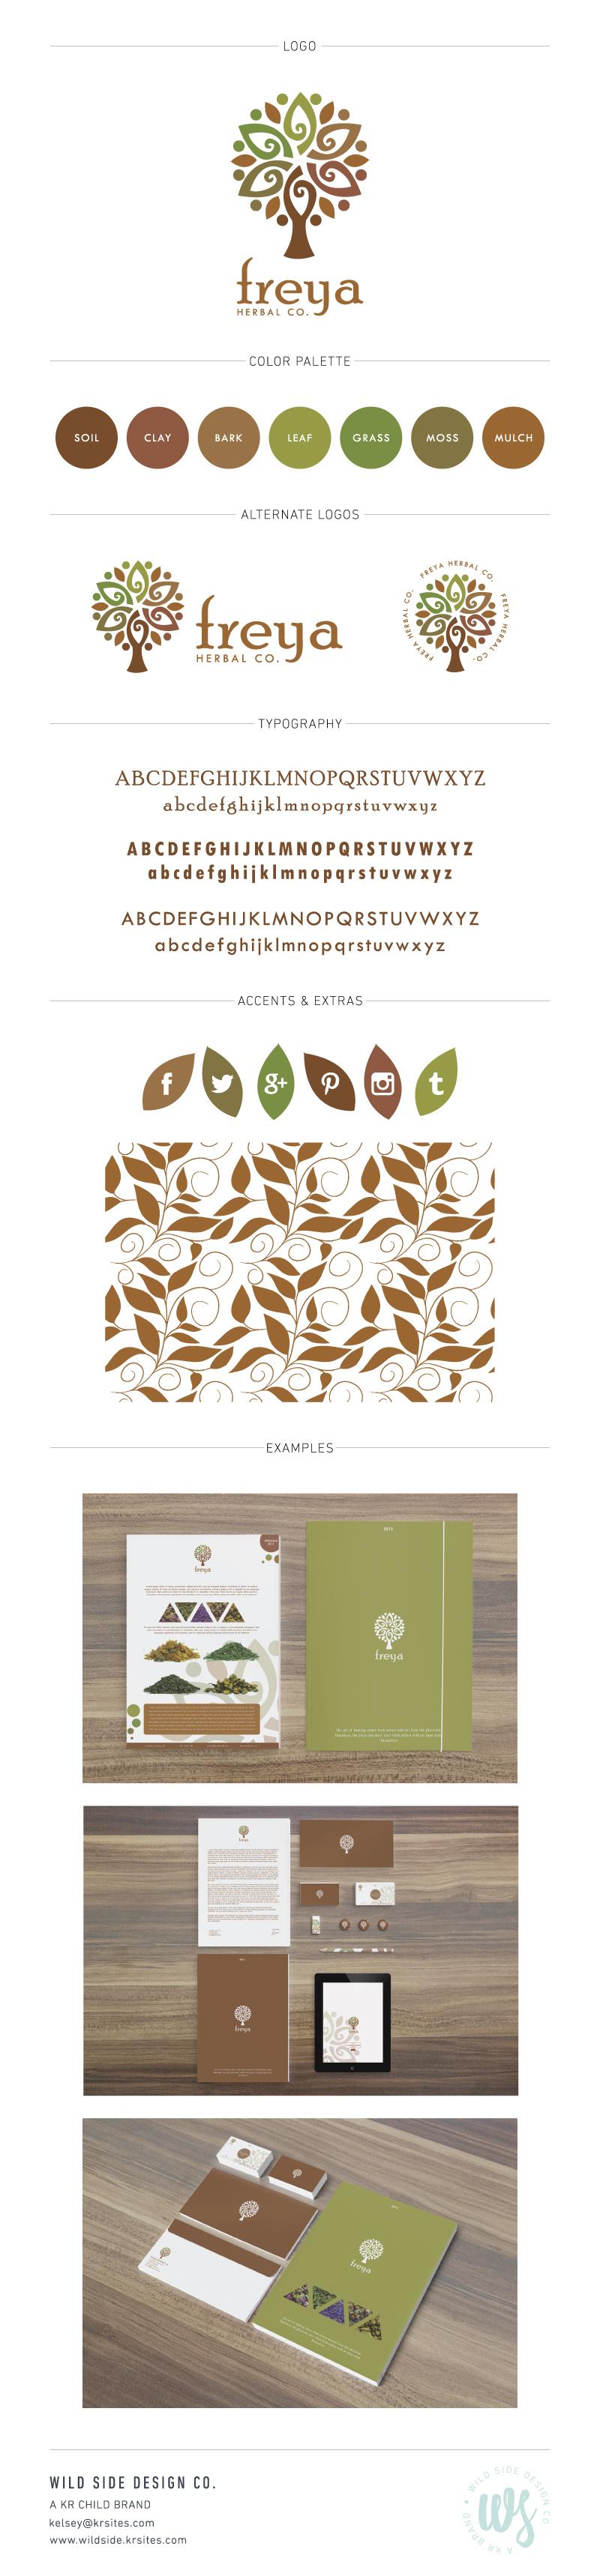 Brand Launch | Brand Style Board | Herbal Company Branding | Freya Herbal Co. Brand Design by Wild Side Design Co. | #branding www.wildside.krsites.com